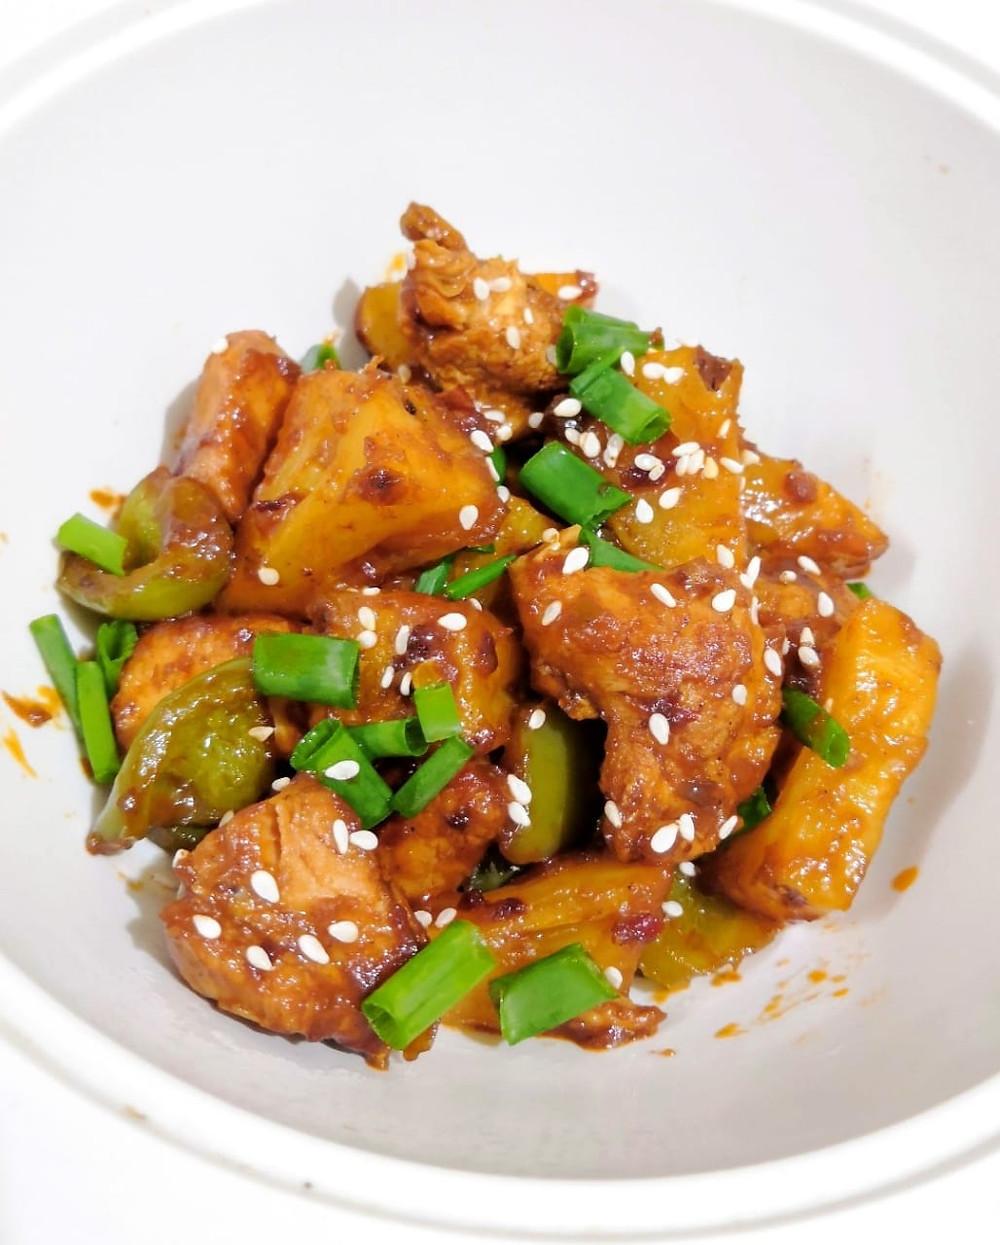 pineapple chicken recipe, orange chicken recipe, chicken recipes, indian chinese recipes, authentic indian food recipe blog whiskmixstir, sheetal jandial